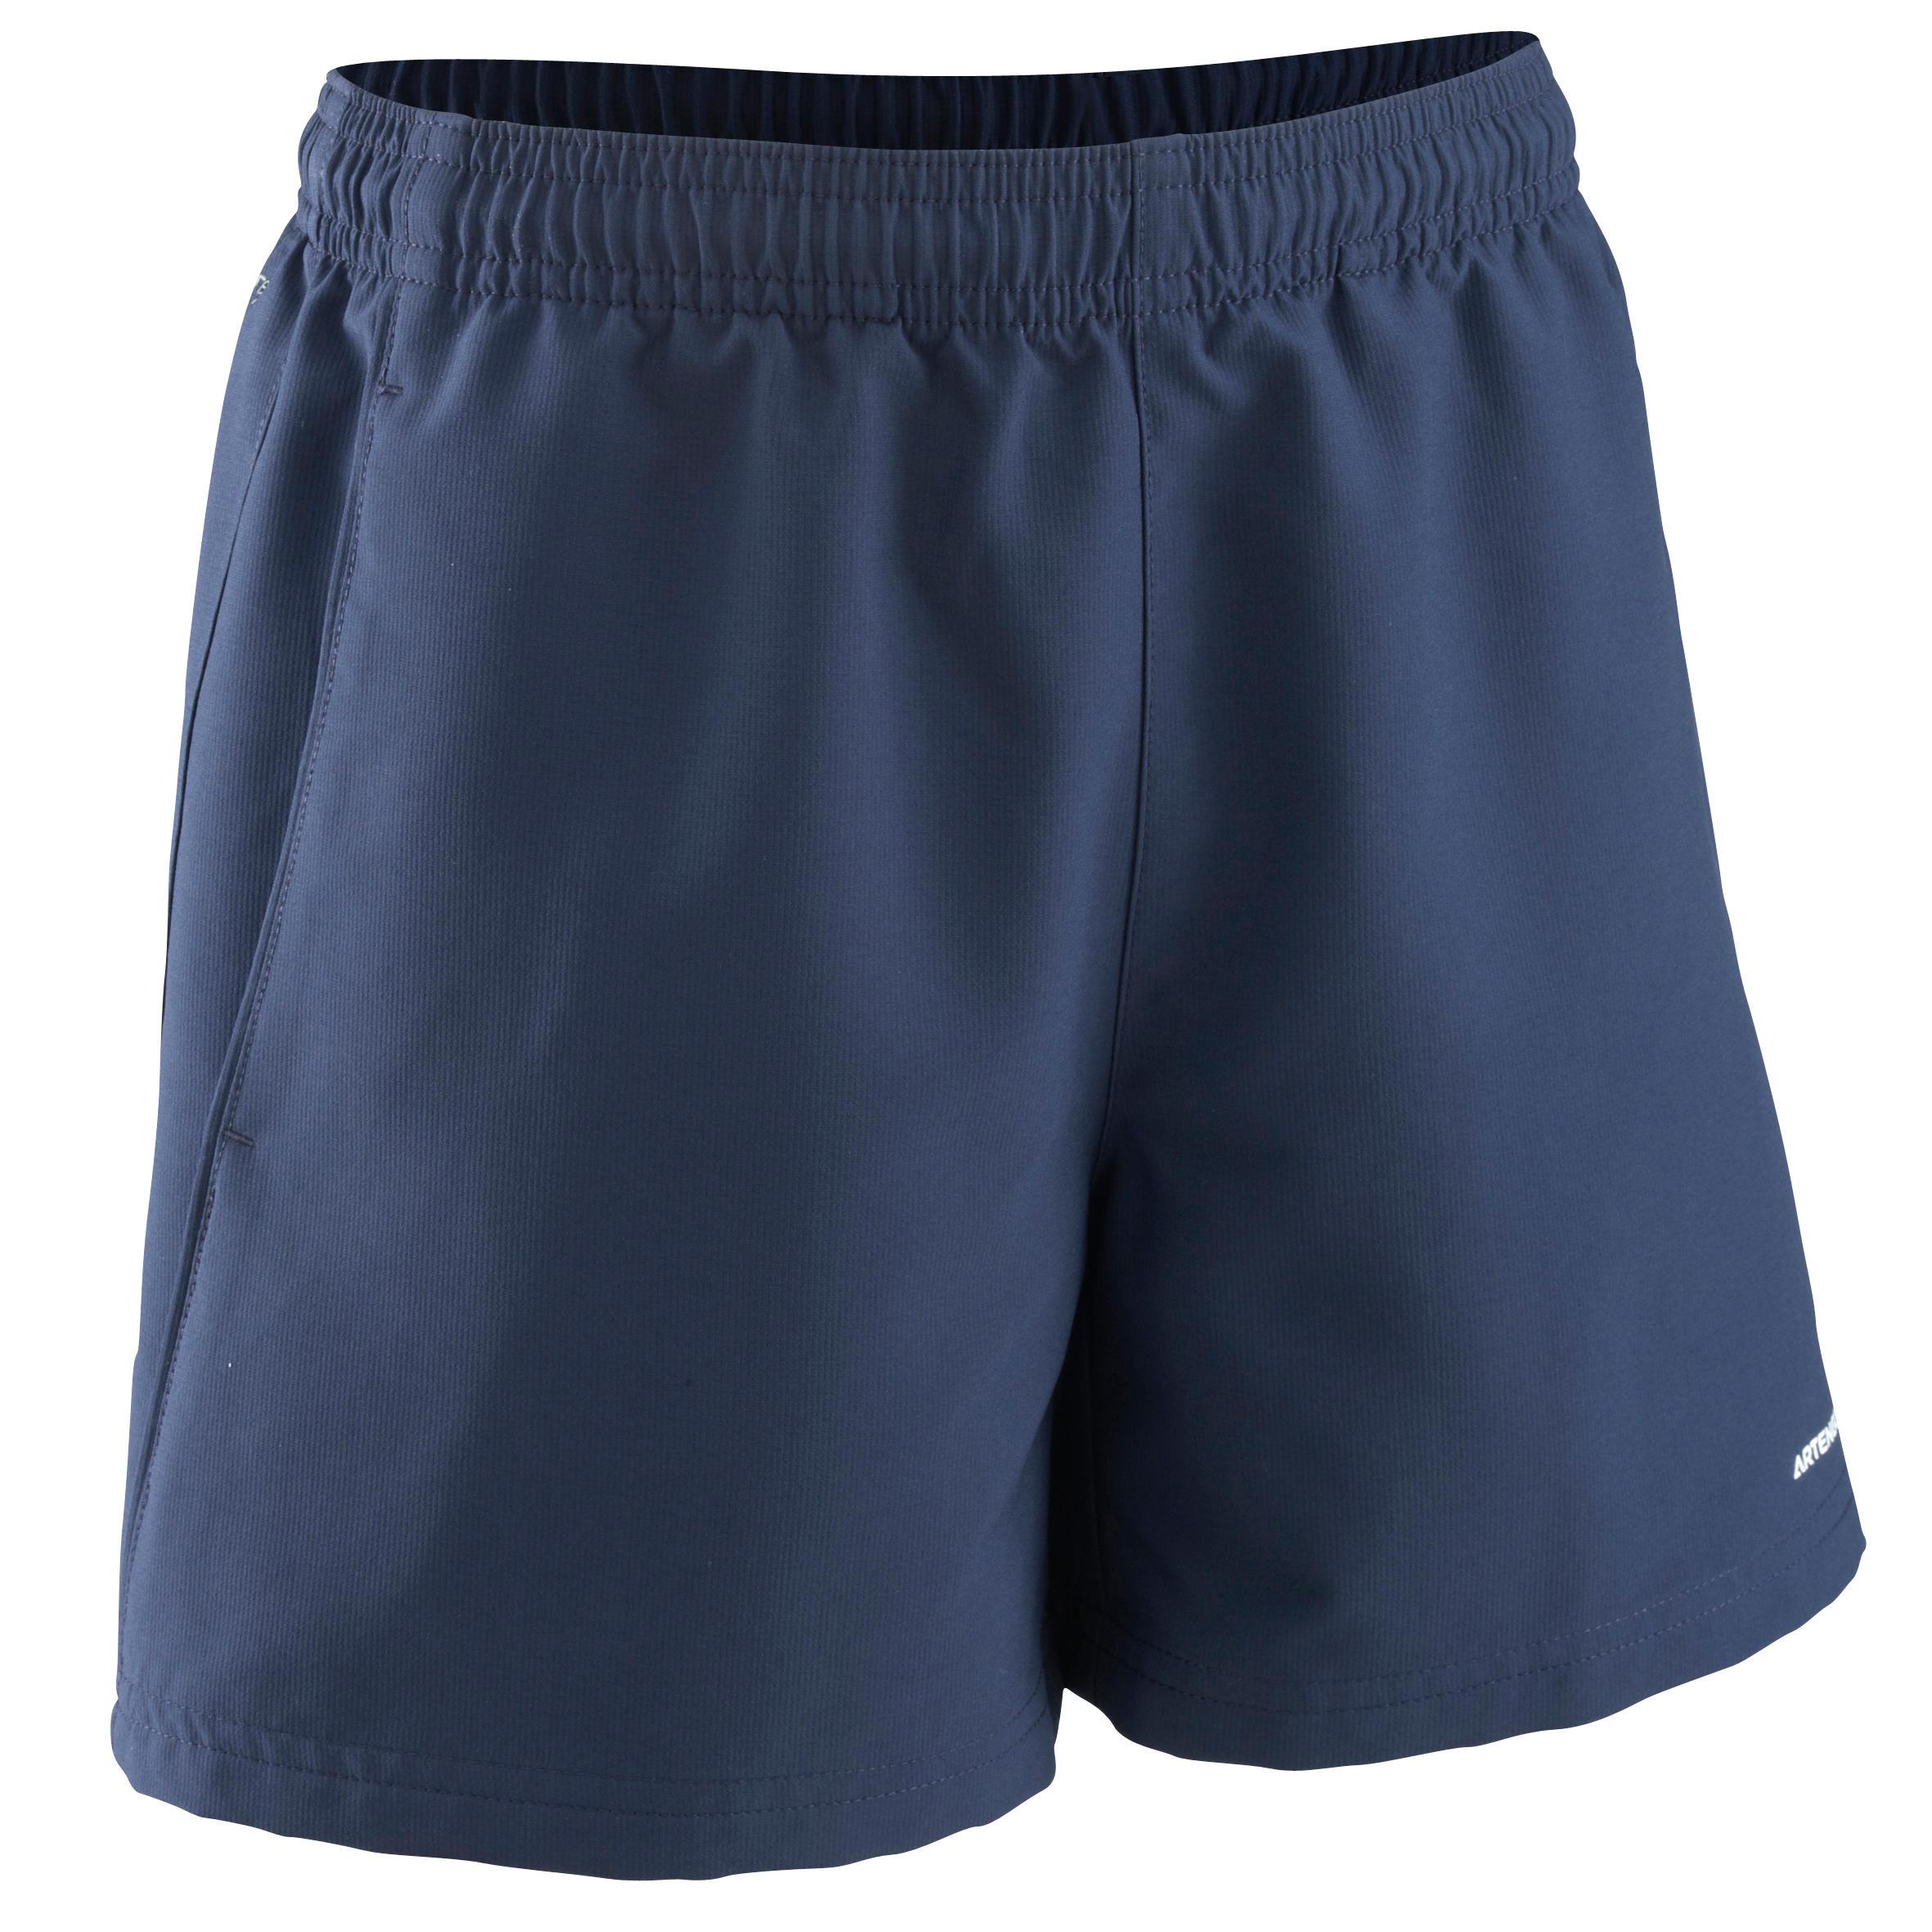 Artengo Kindershort Essential wit badminton/tafeltennis/tennis/padel/squash